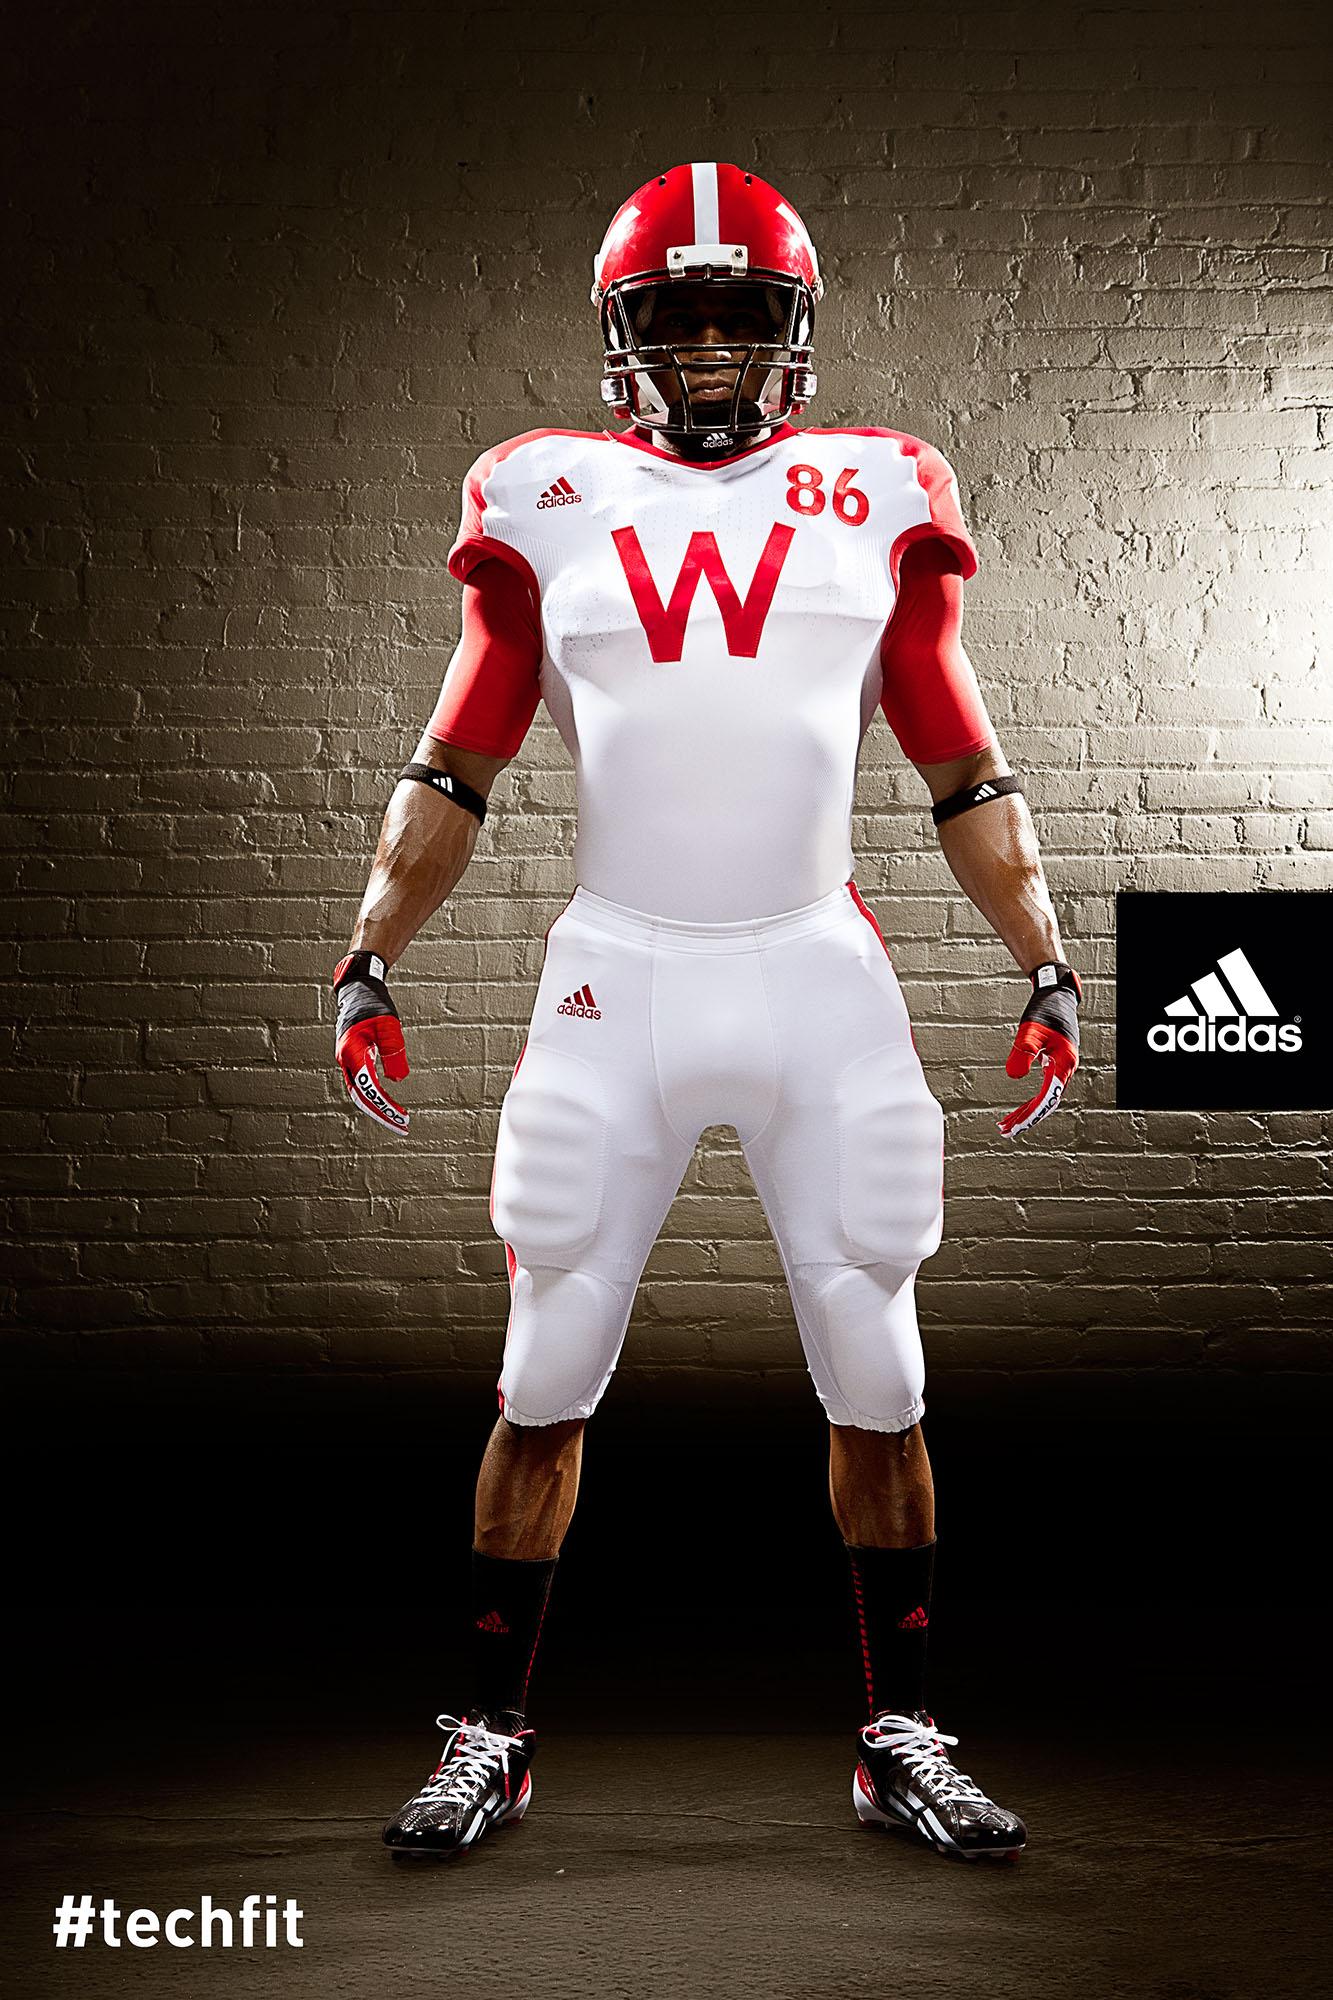 Badgers unveil new uniform for Nebraska game - Wisconsin Radio Network 0d4f35bd3